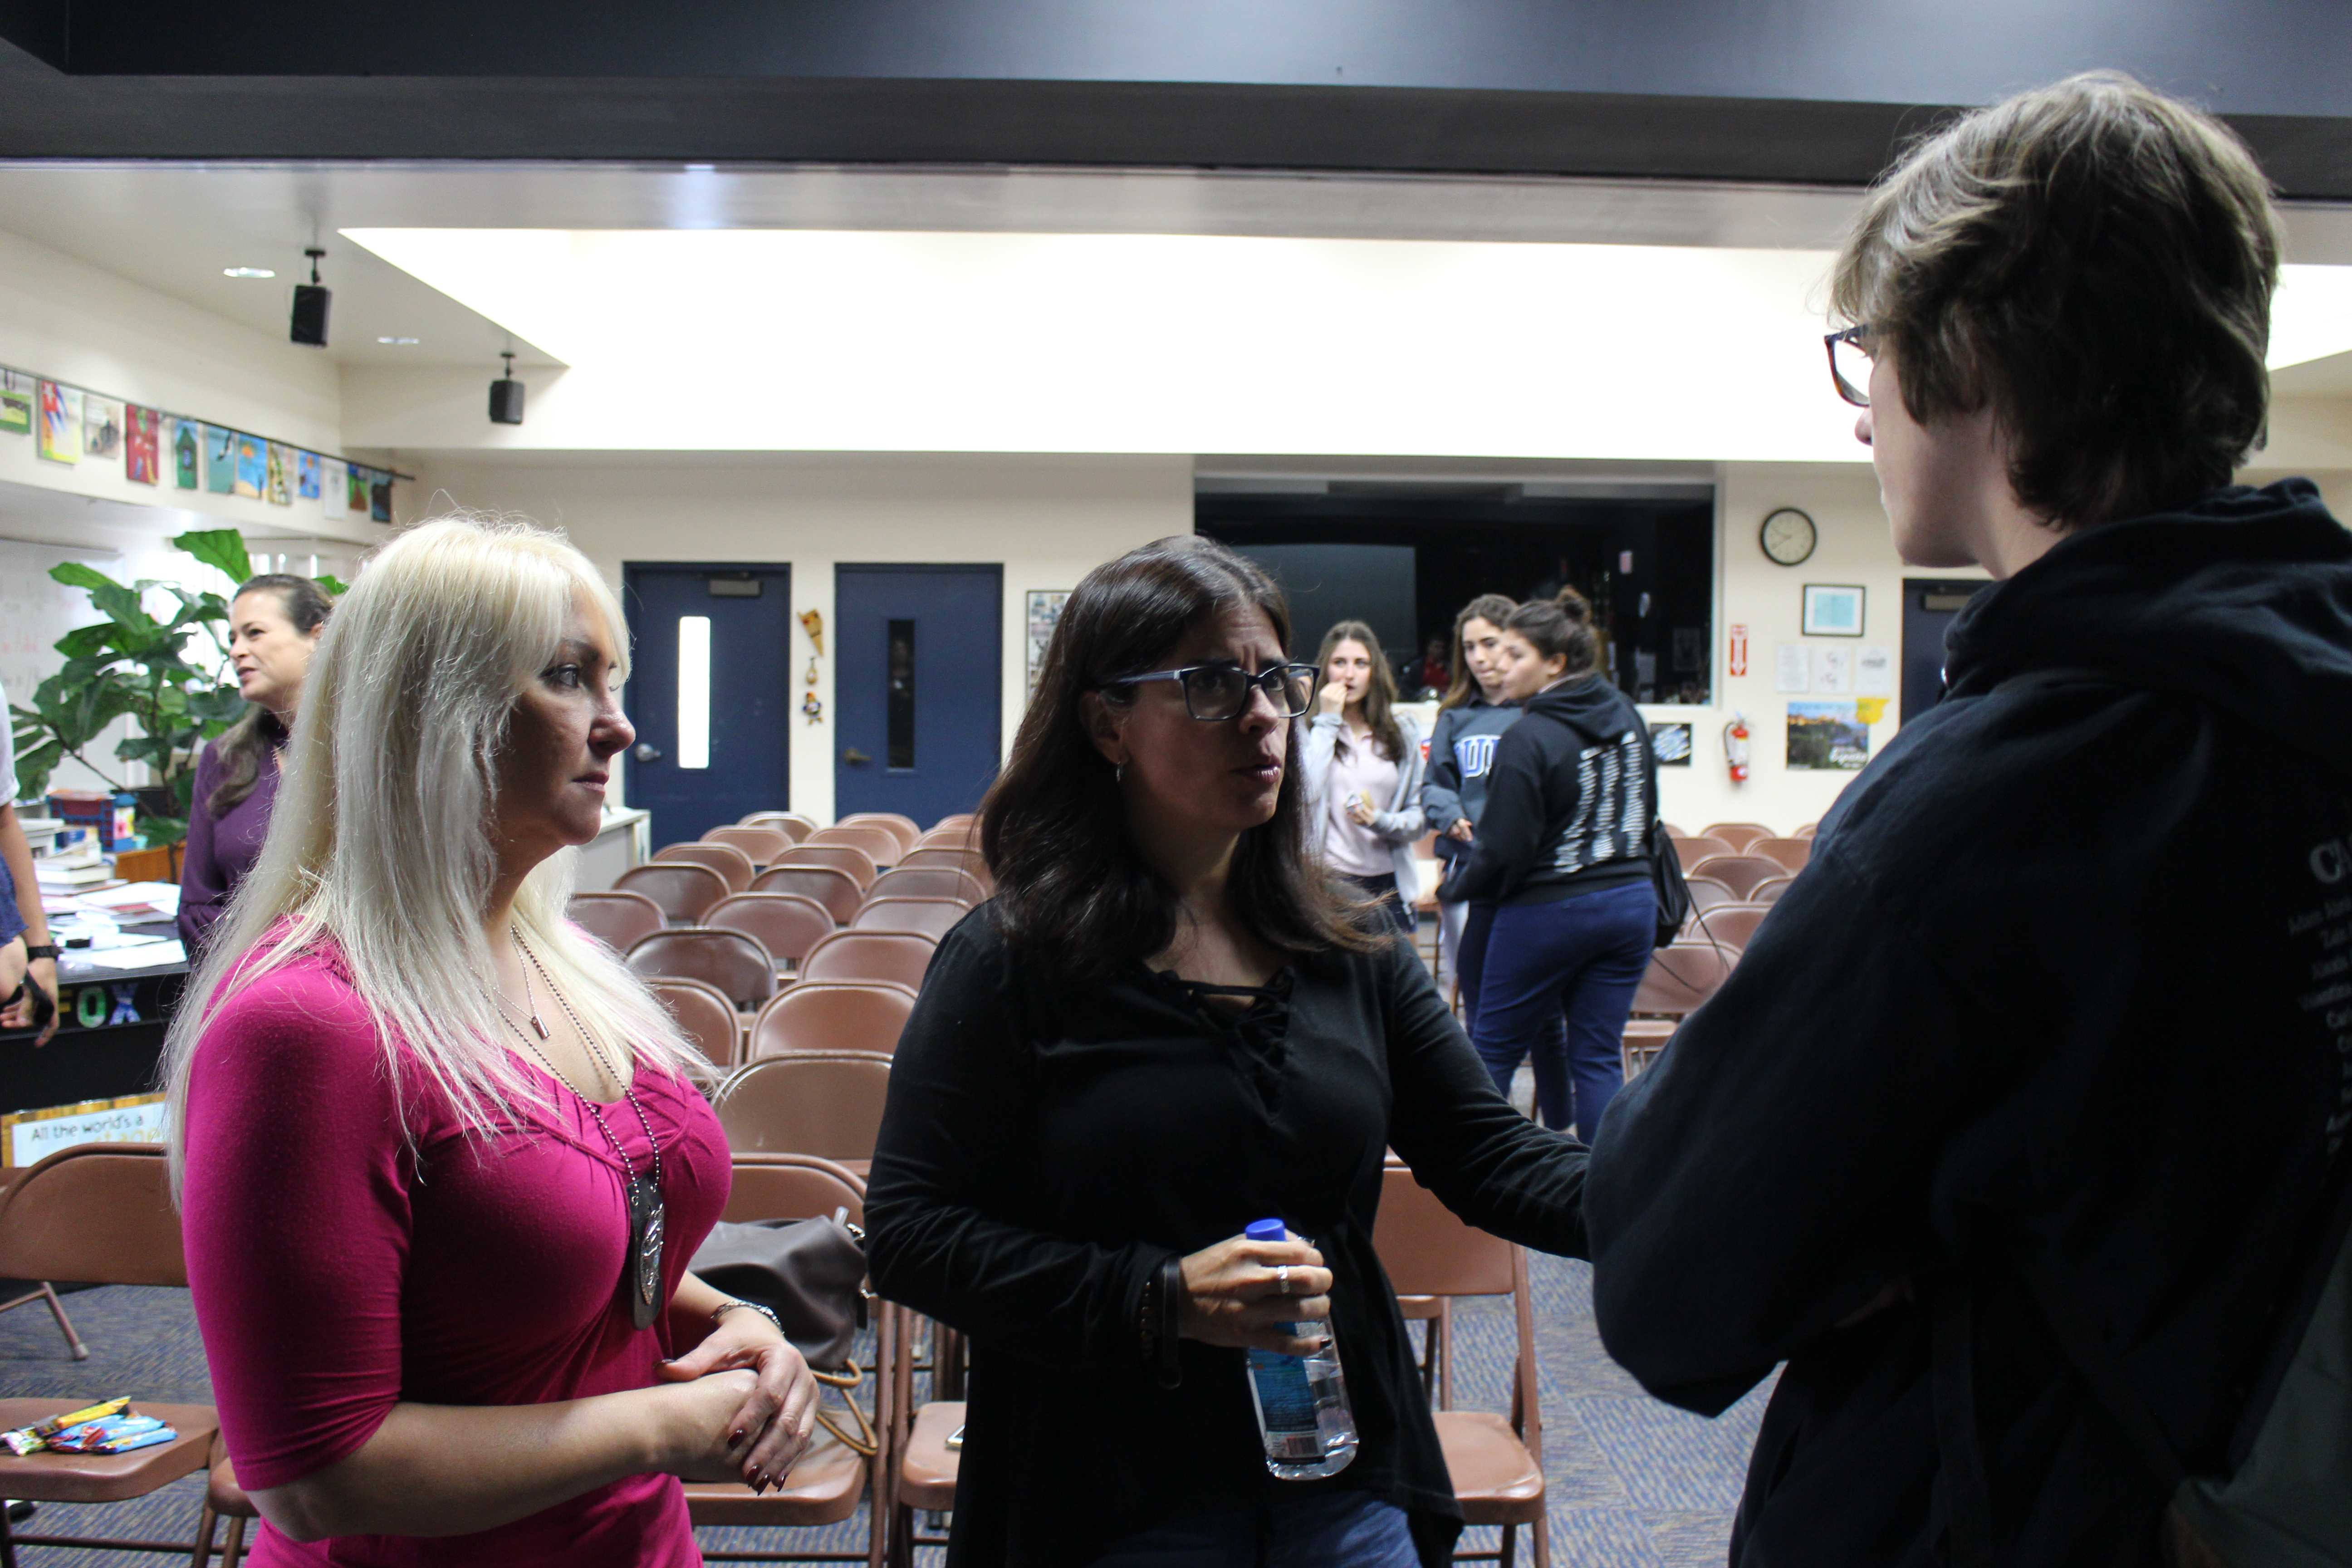 Human trafficking presentation educates students